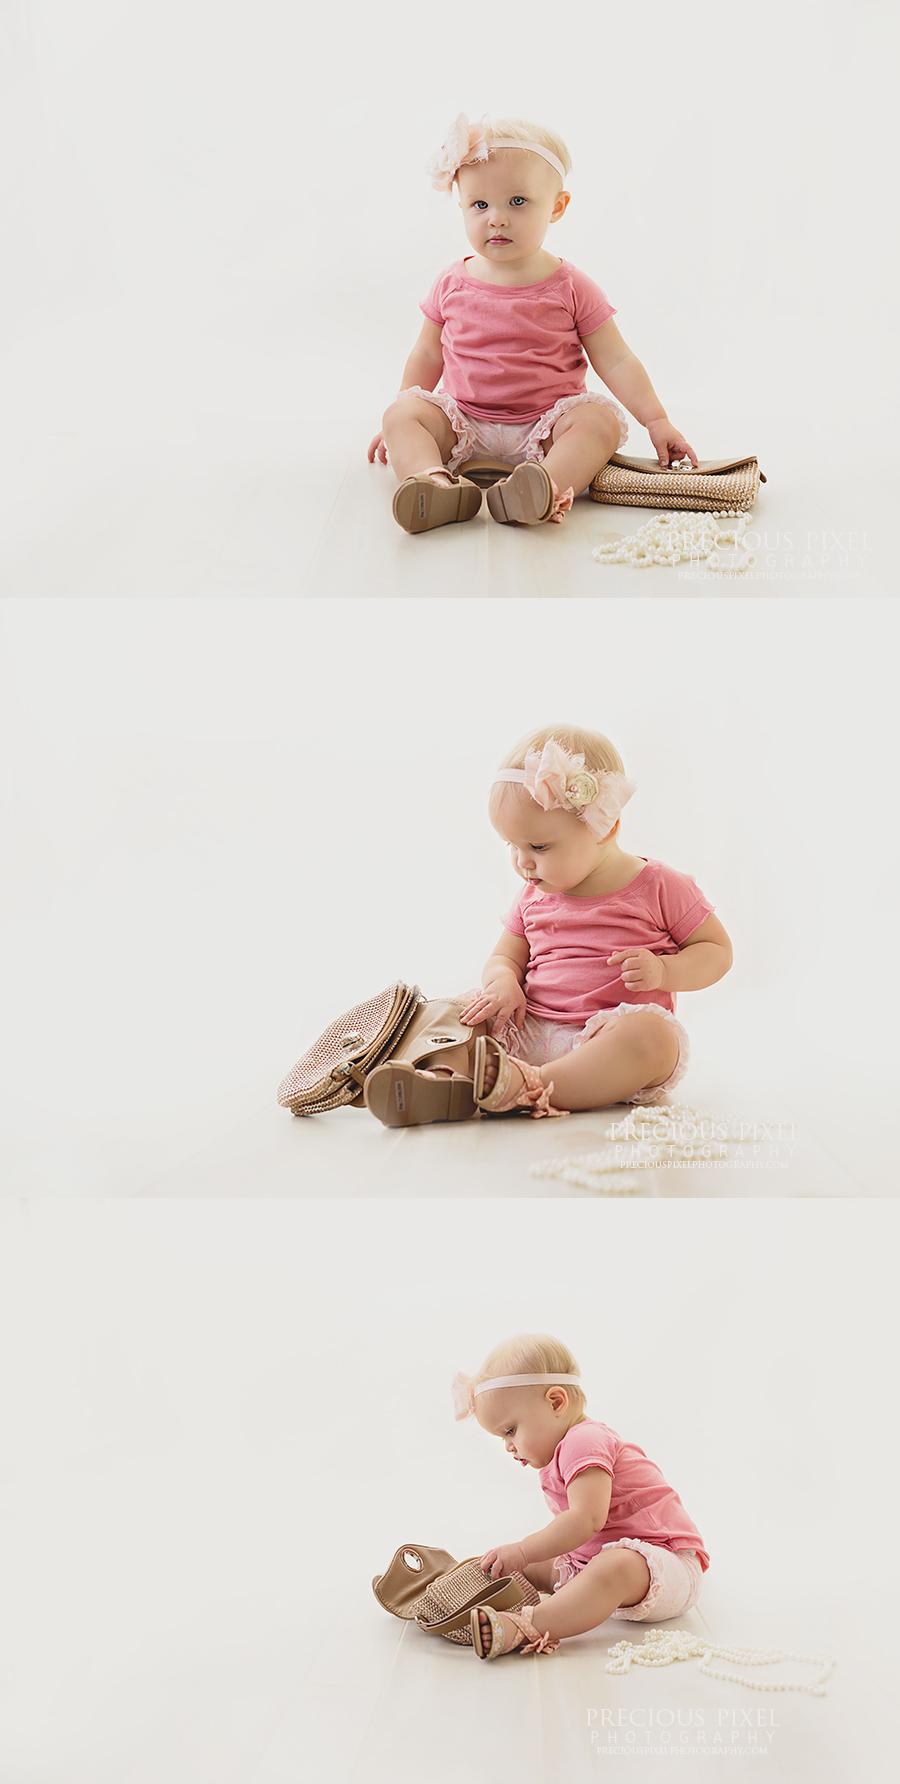 babies first Birthday photos, southeast-michigan-newborn-photographer/one-year-old-photo-shoot, back lit photo